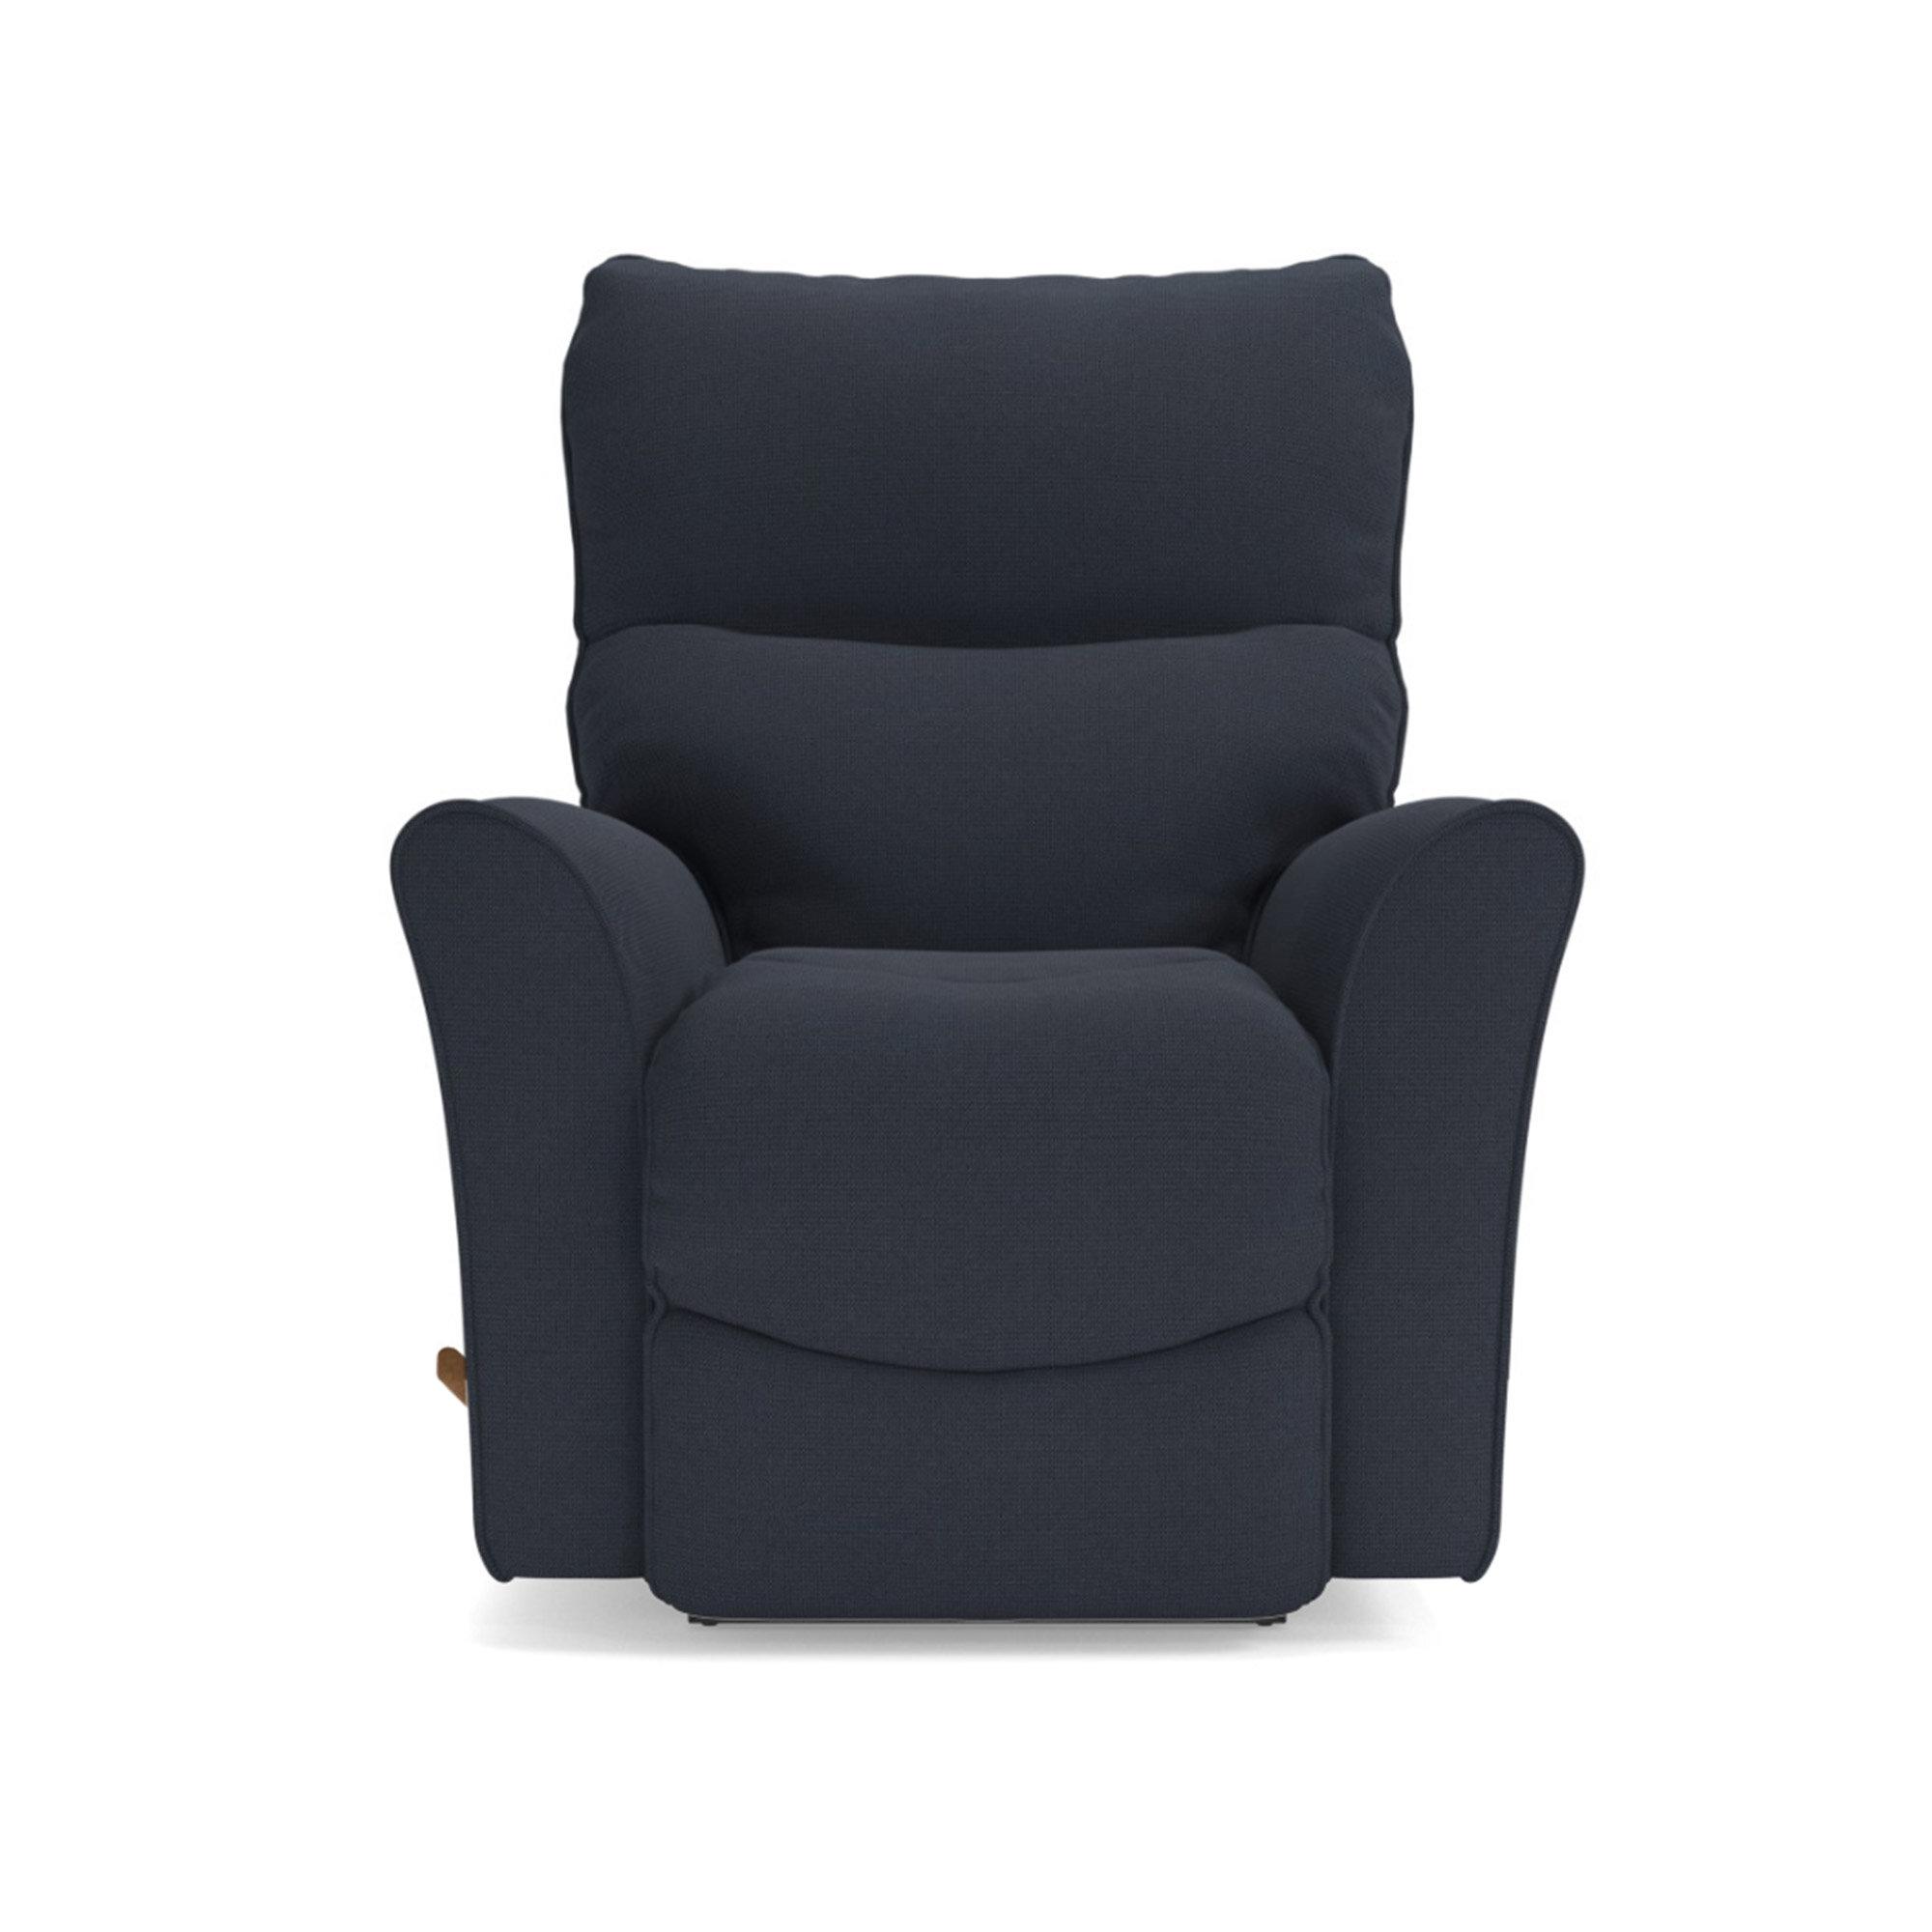 Wondrous Rowan Recliner Evergreenethics Interior Chair Design Evergreenethicsorg